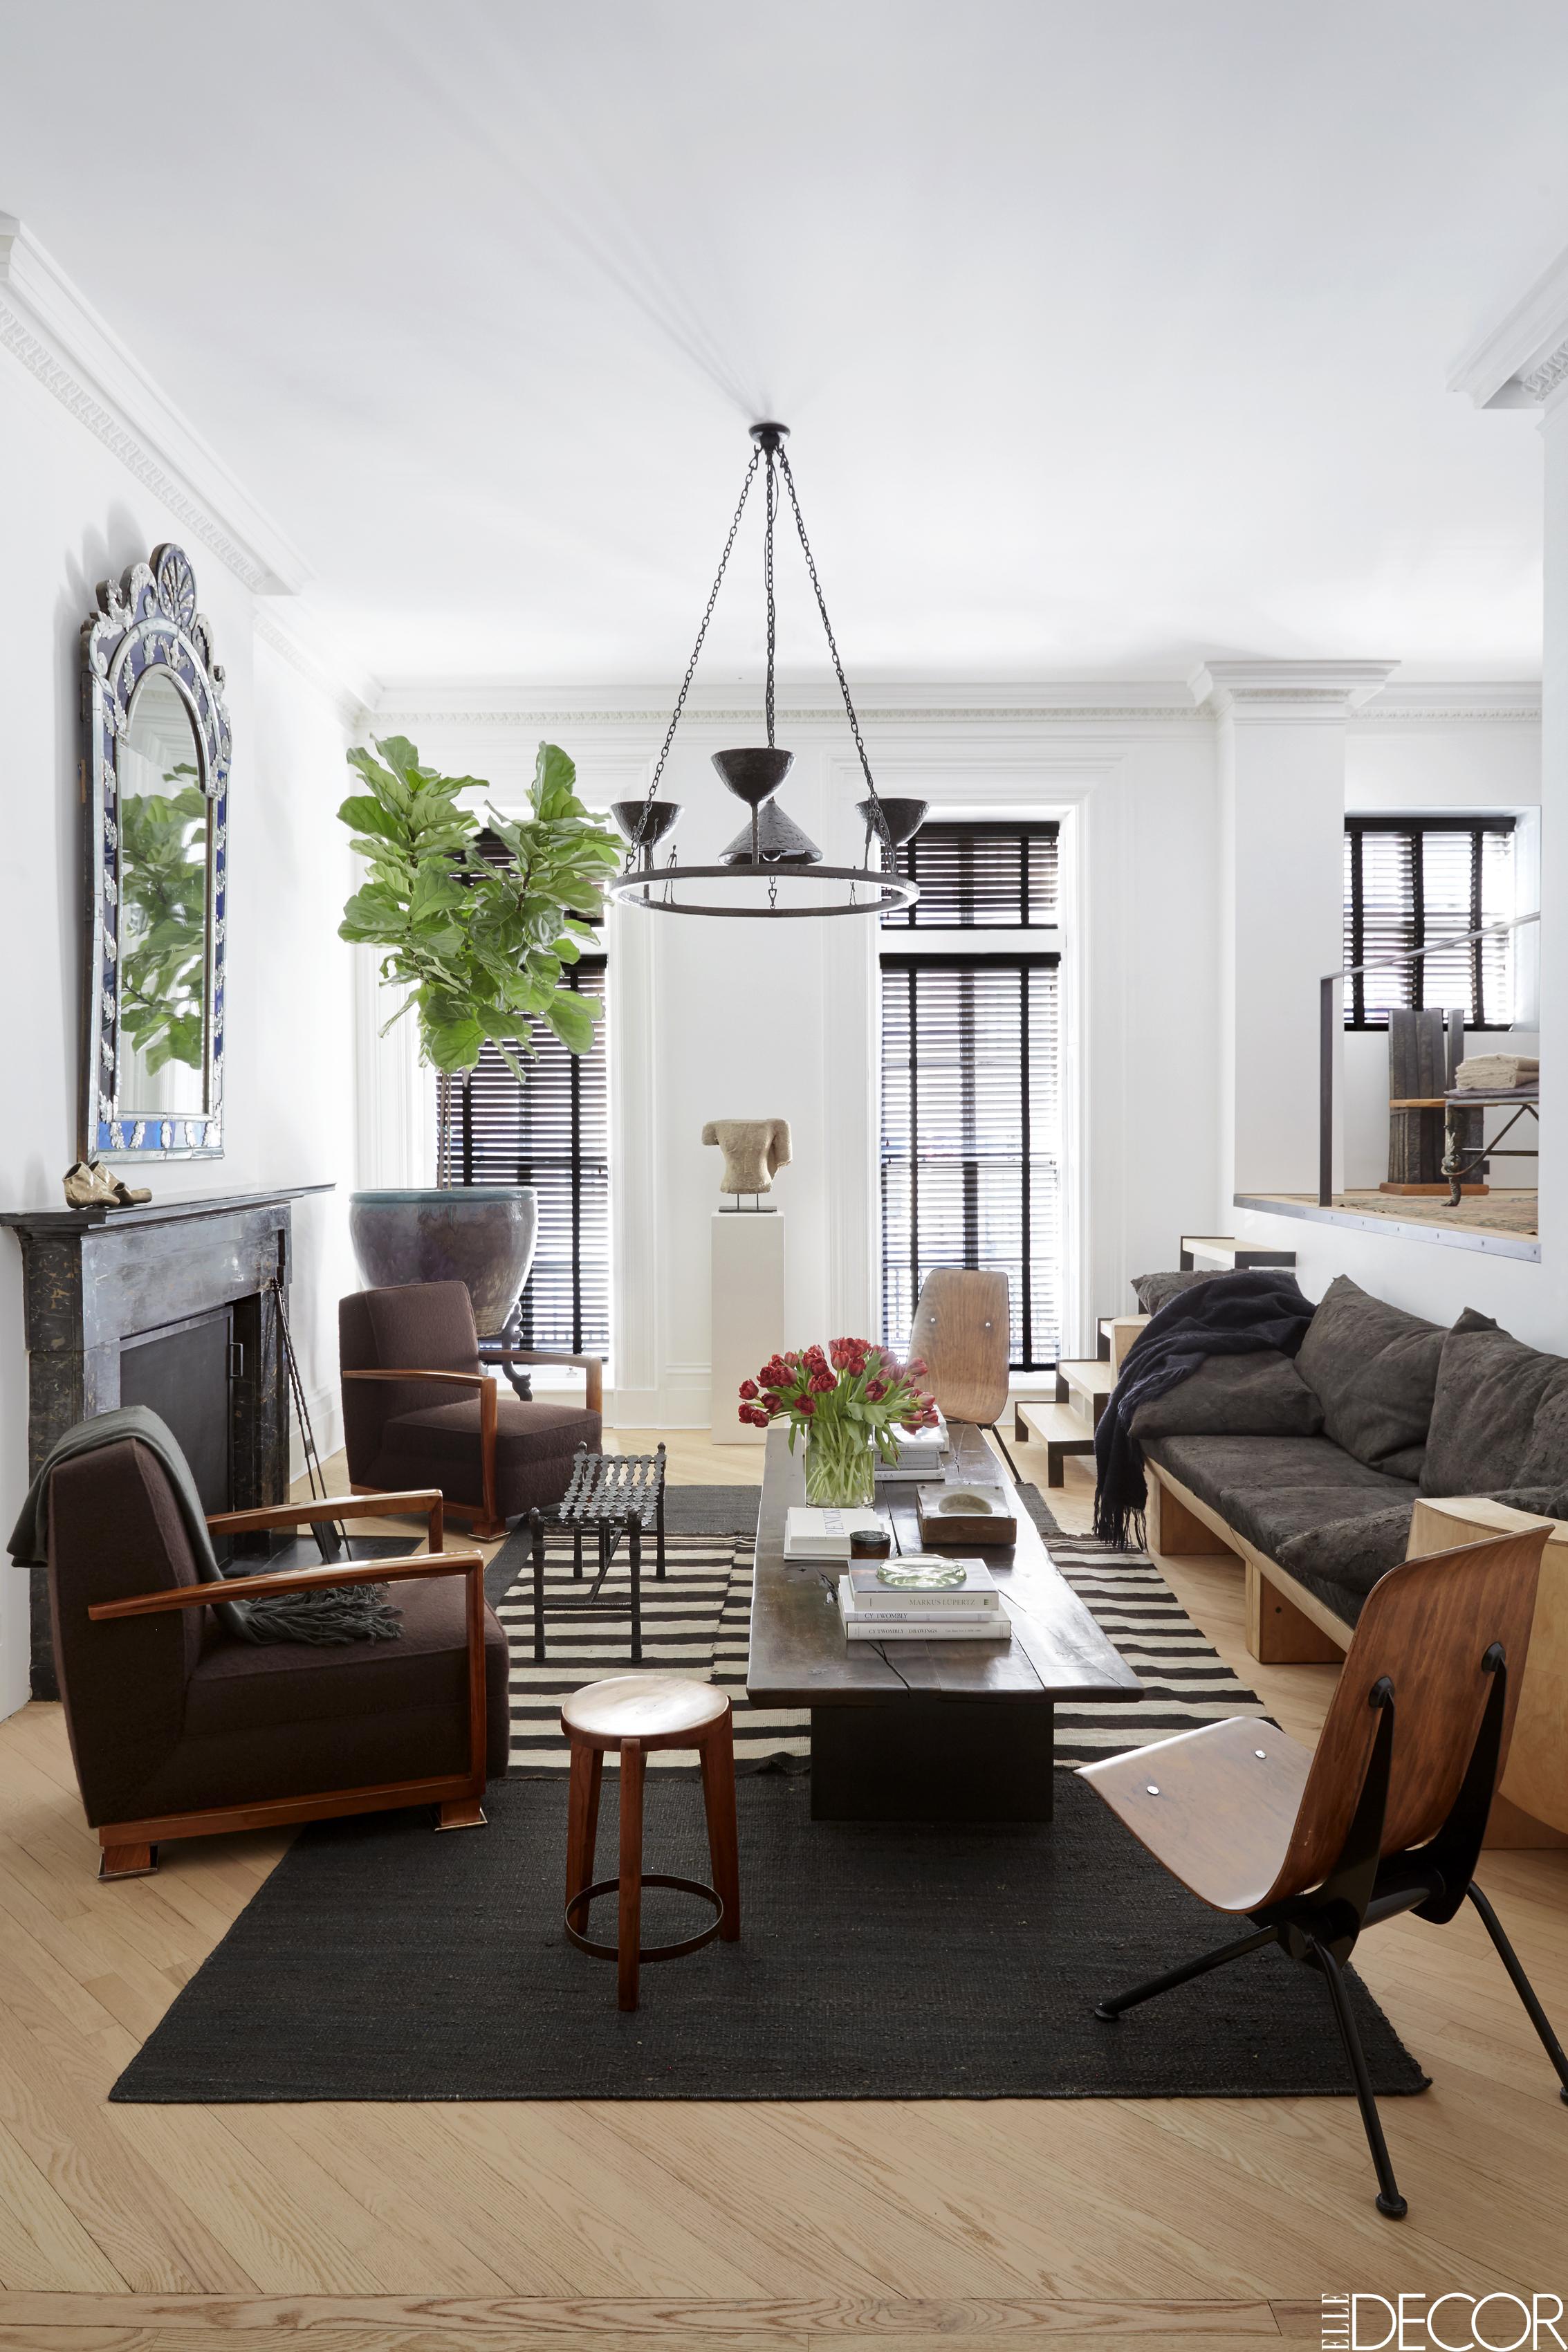 20 Best Living Room Ideas - Beautiful Living Room Decor on Beautiful Room Decor  id=11294